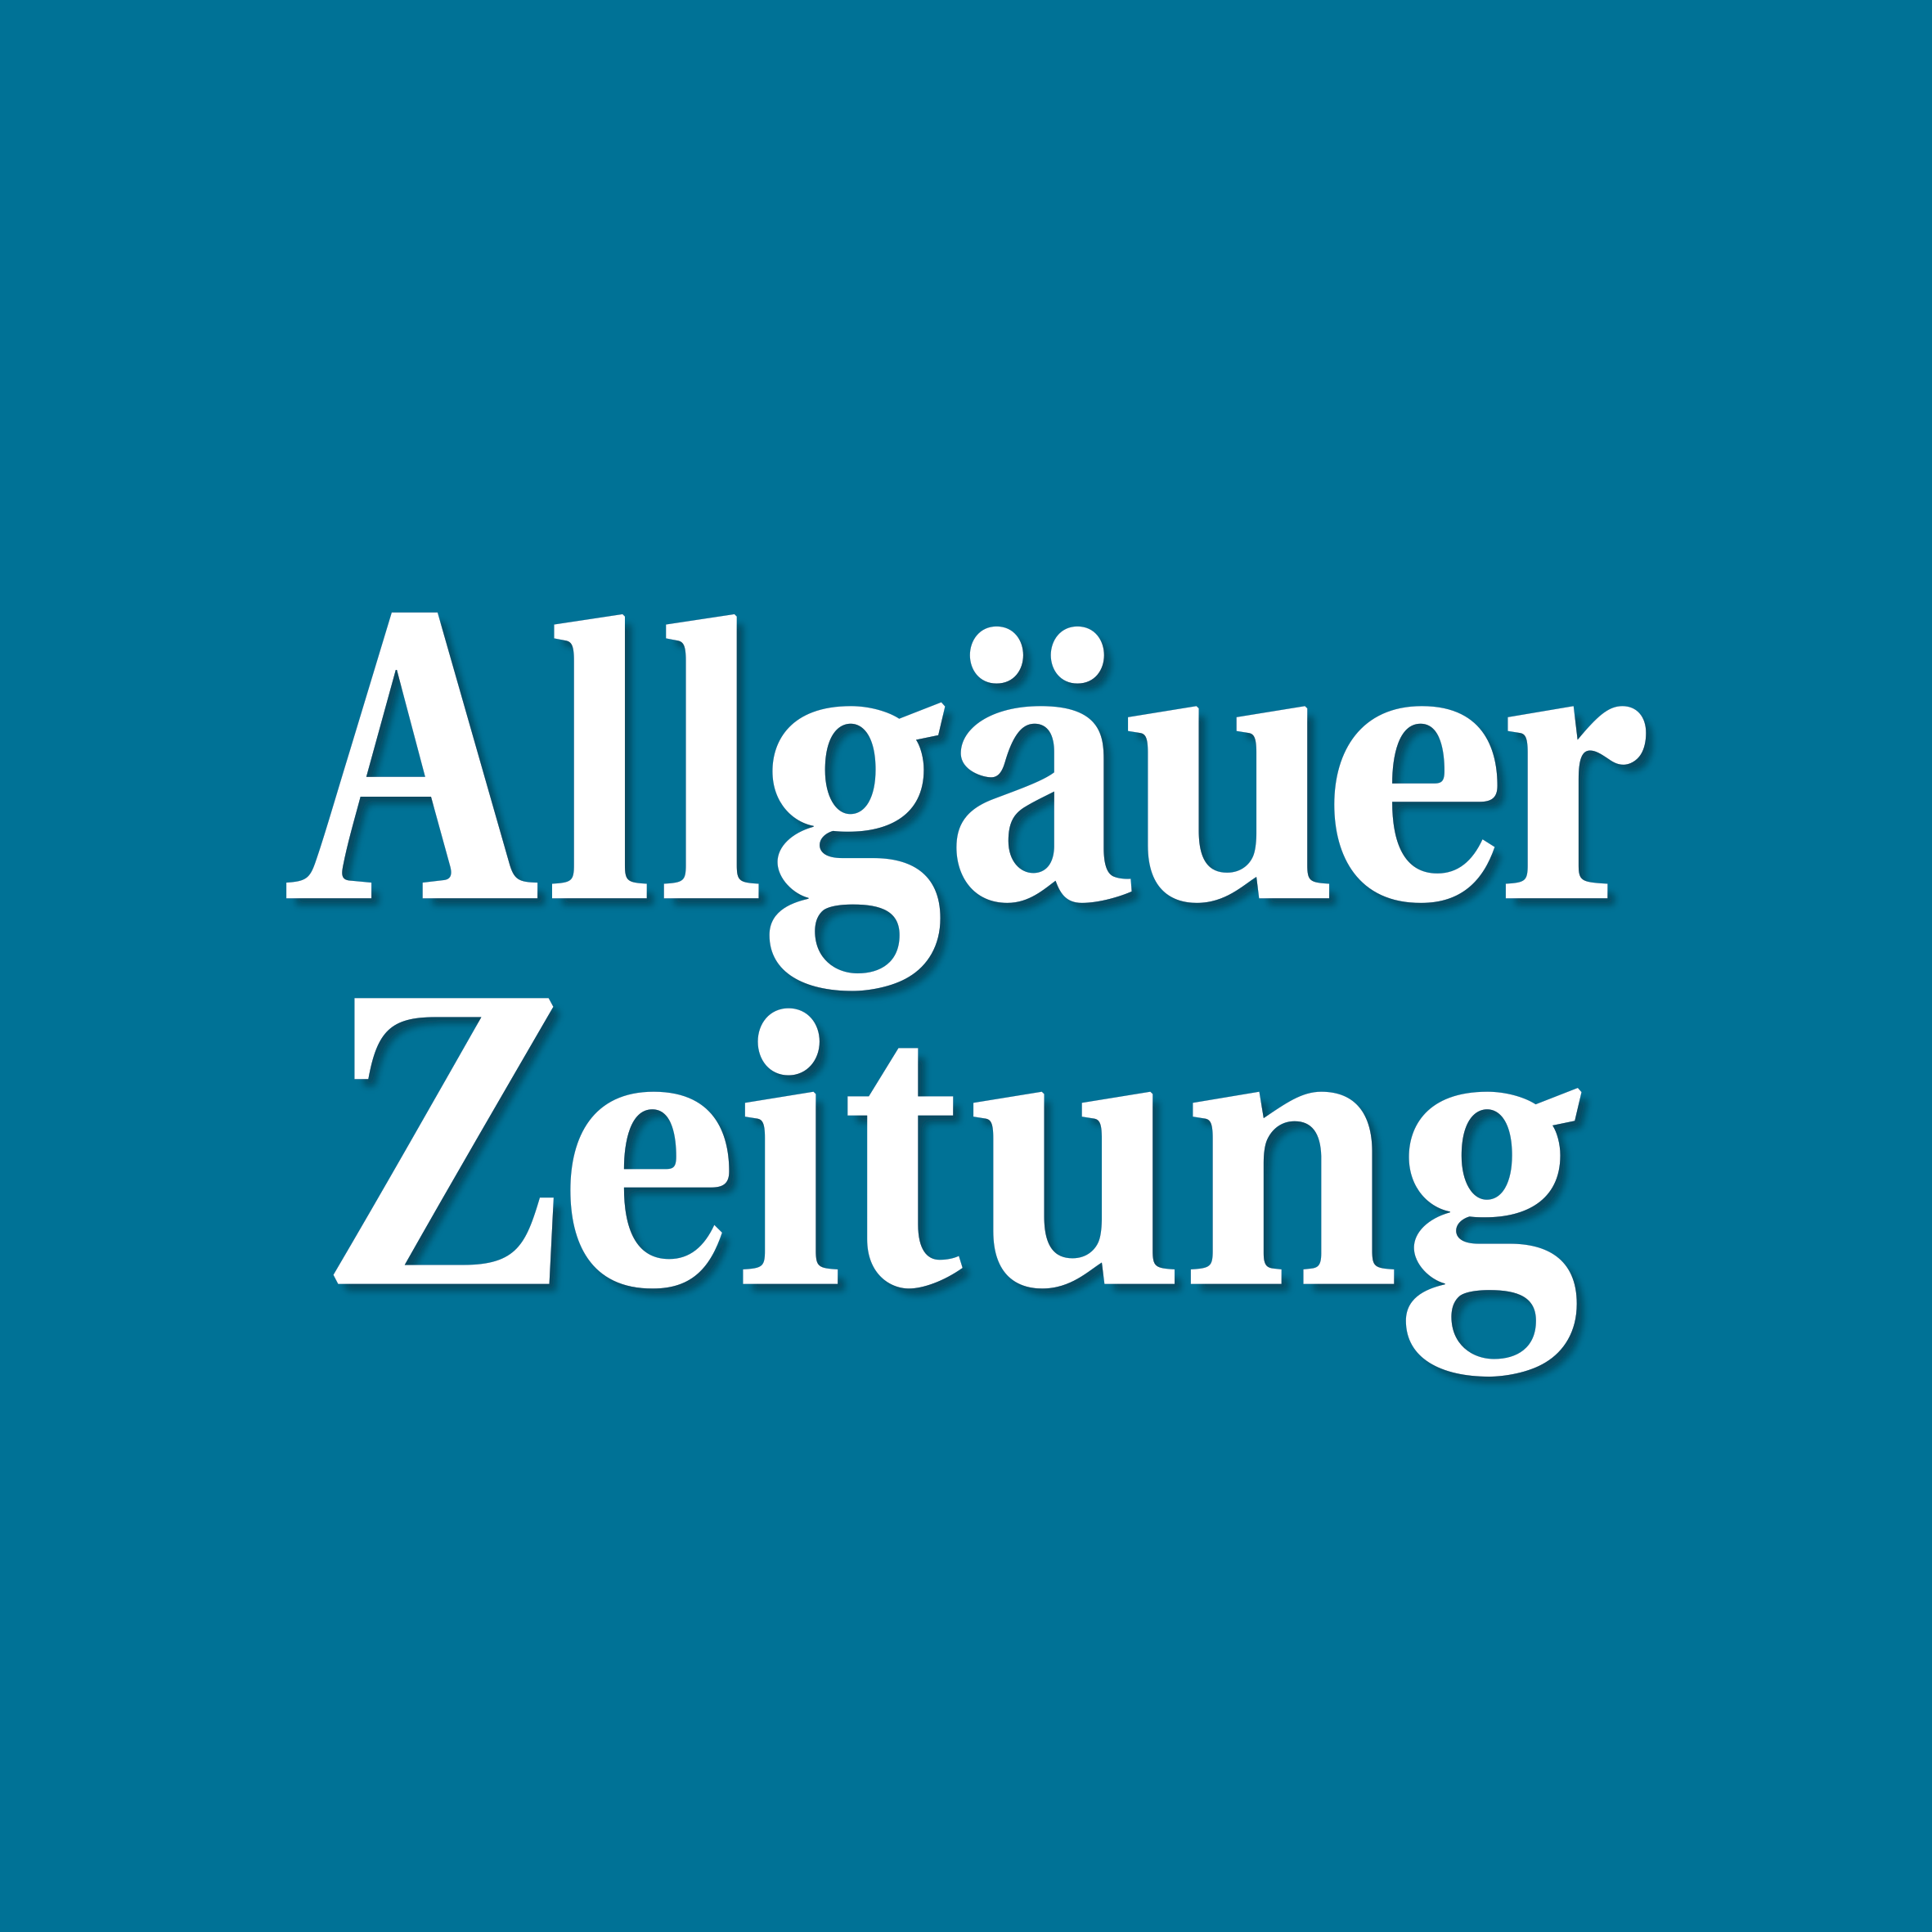 Logo_Allgäuer_Zeitung_-_Ab_August_2013_(PNG)